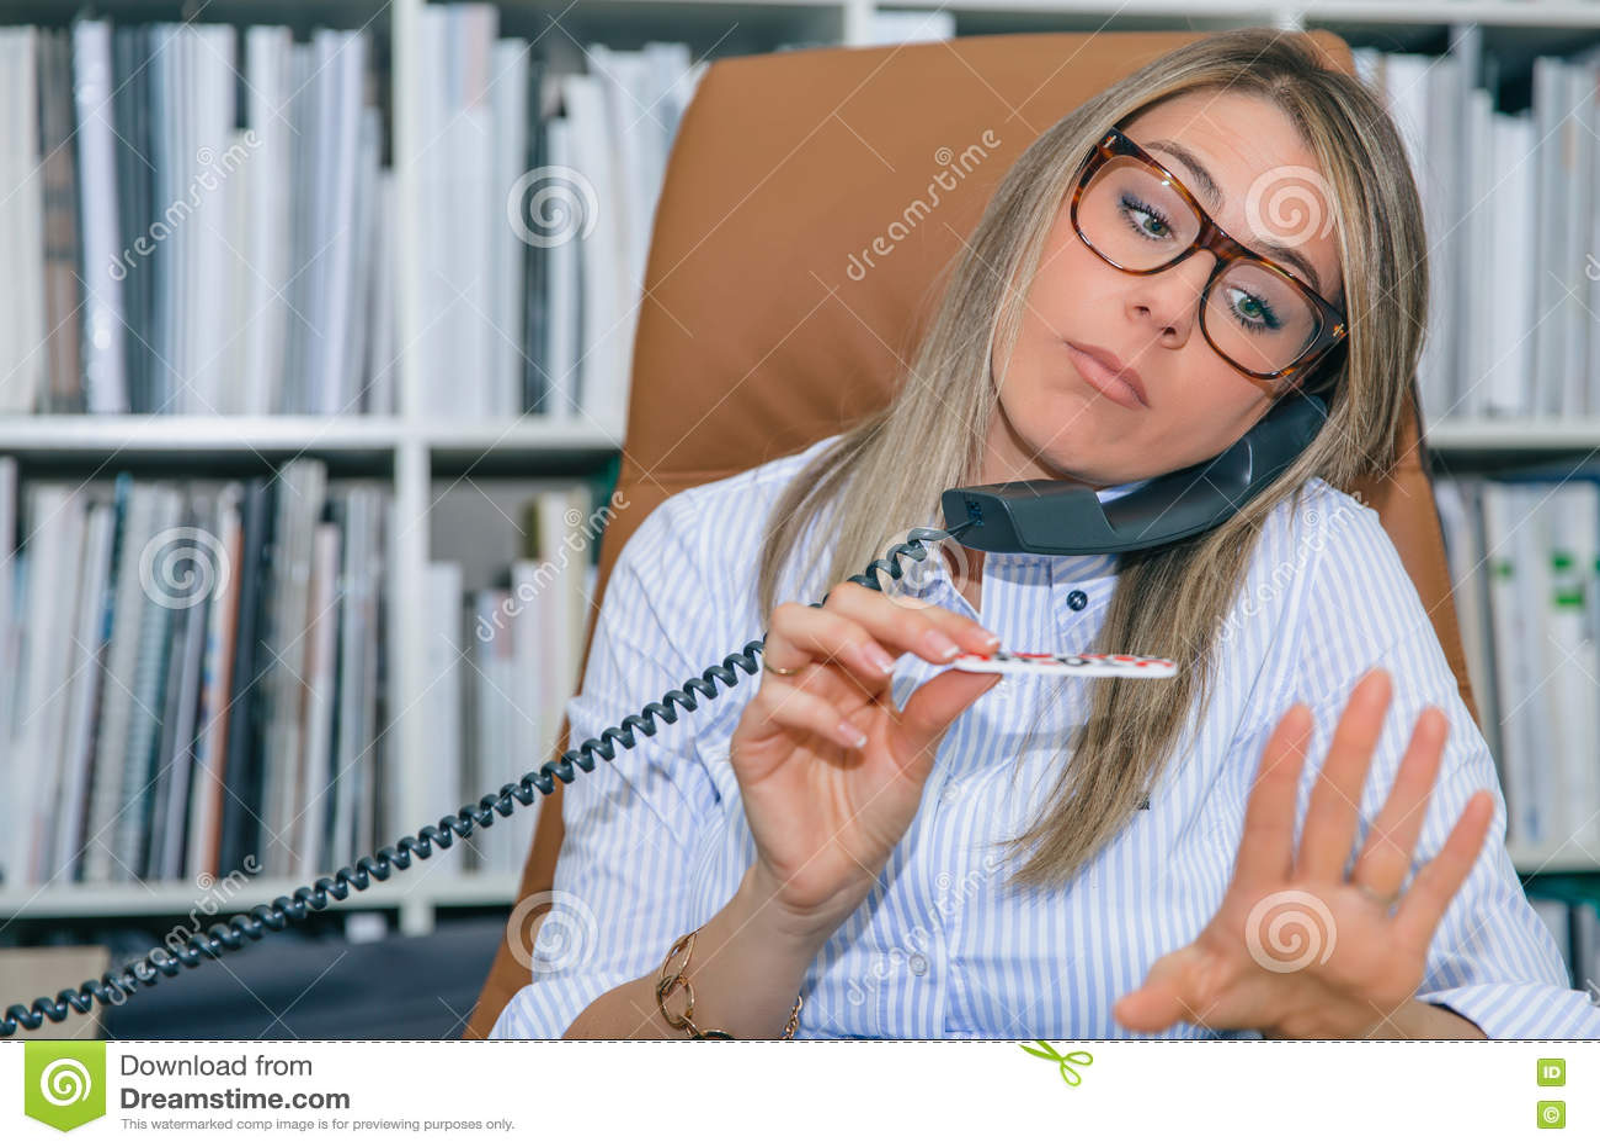 bored-secretary-polishing-nails-talking-